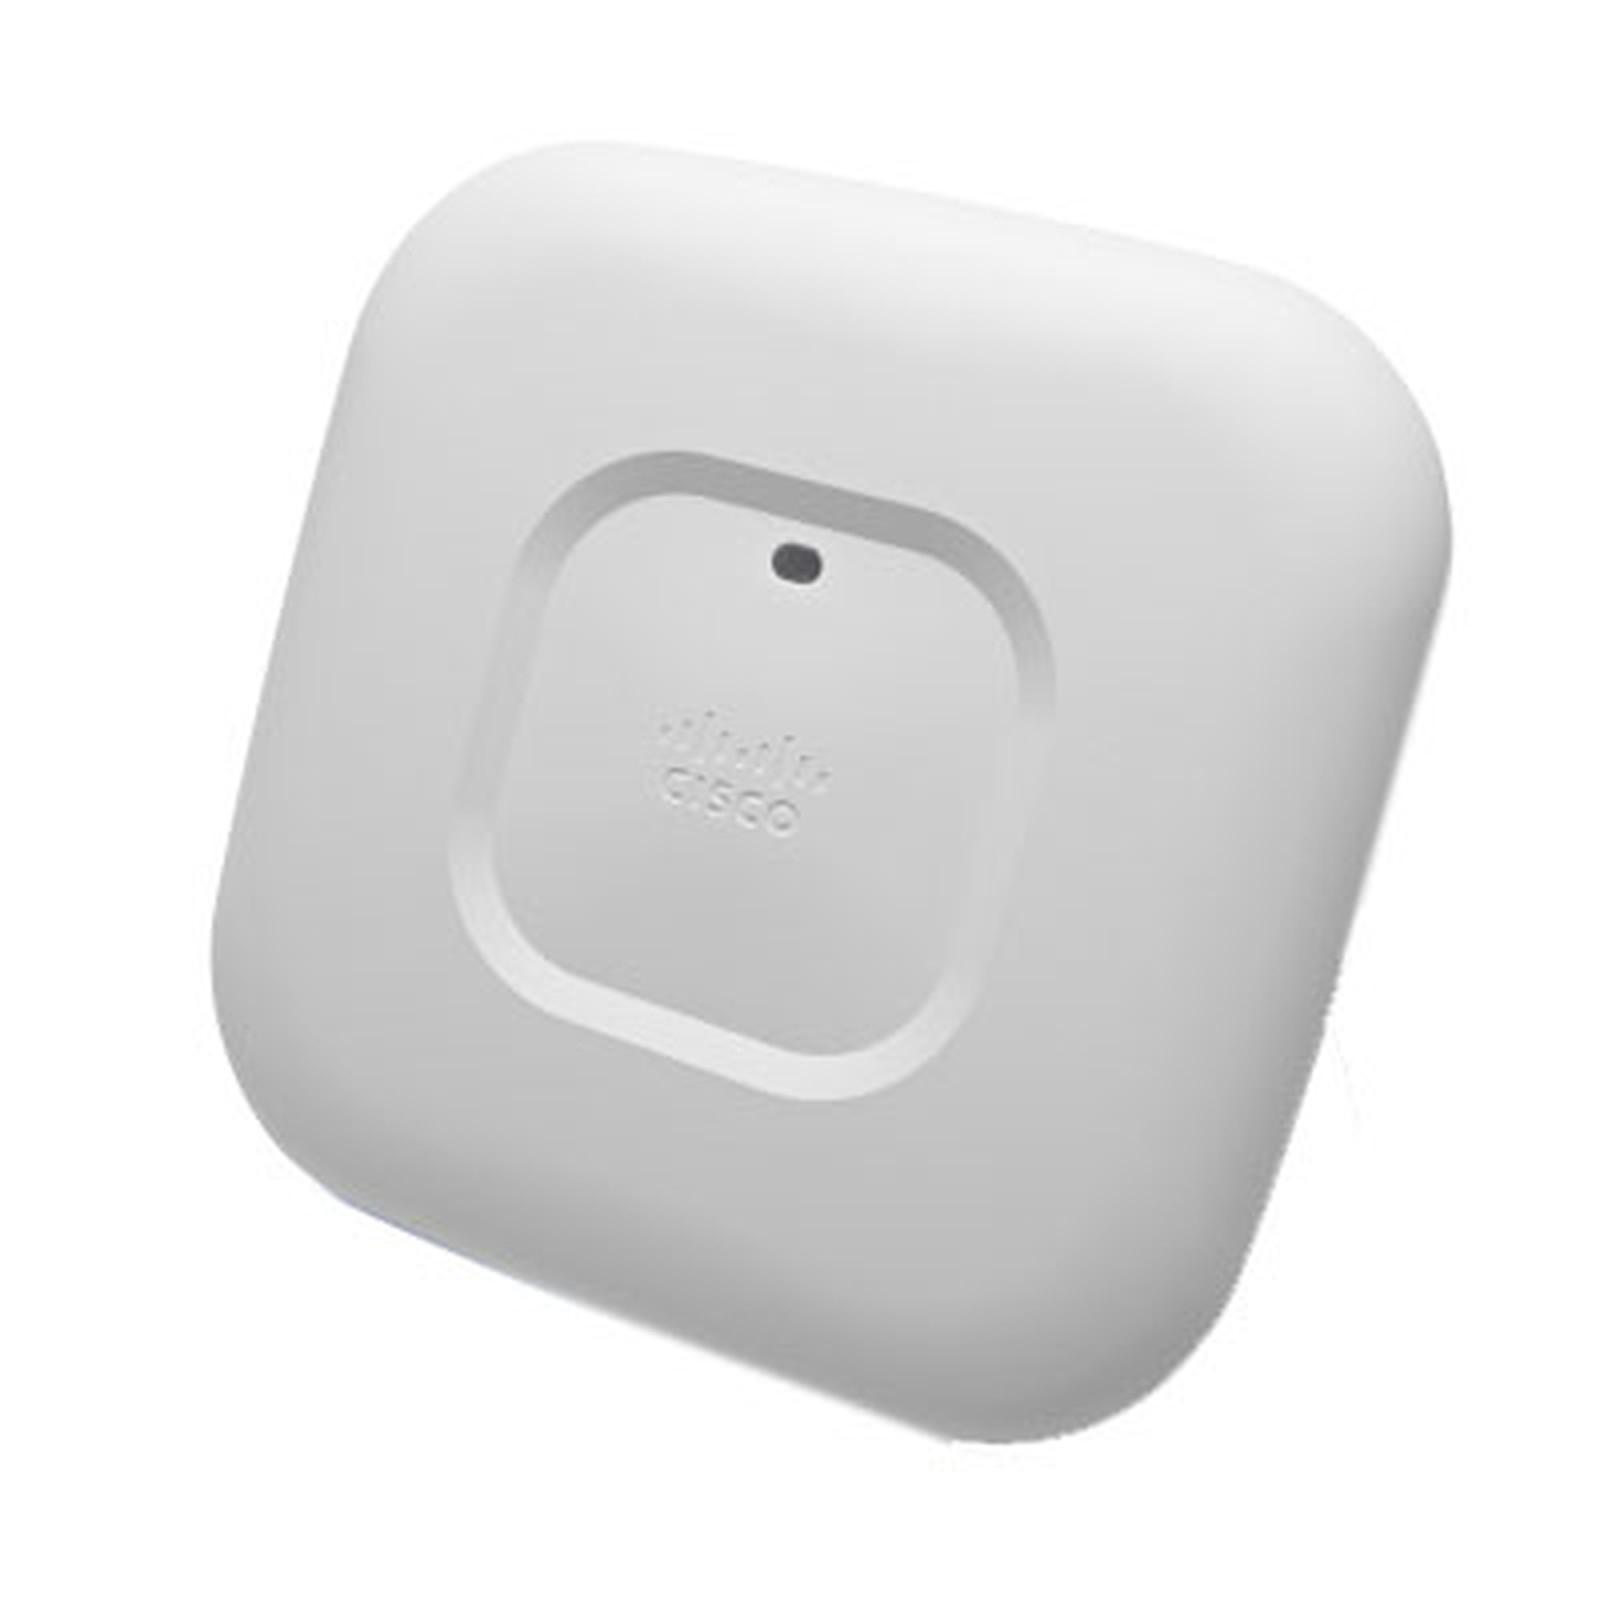 Cisco Aironet 2702i Access Point (AIR-CAP2702I-E-K9)